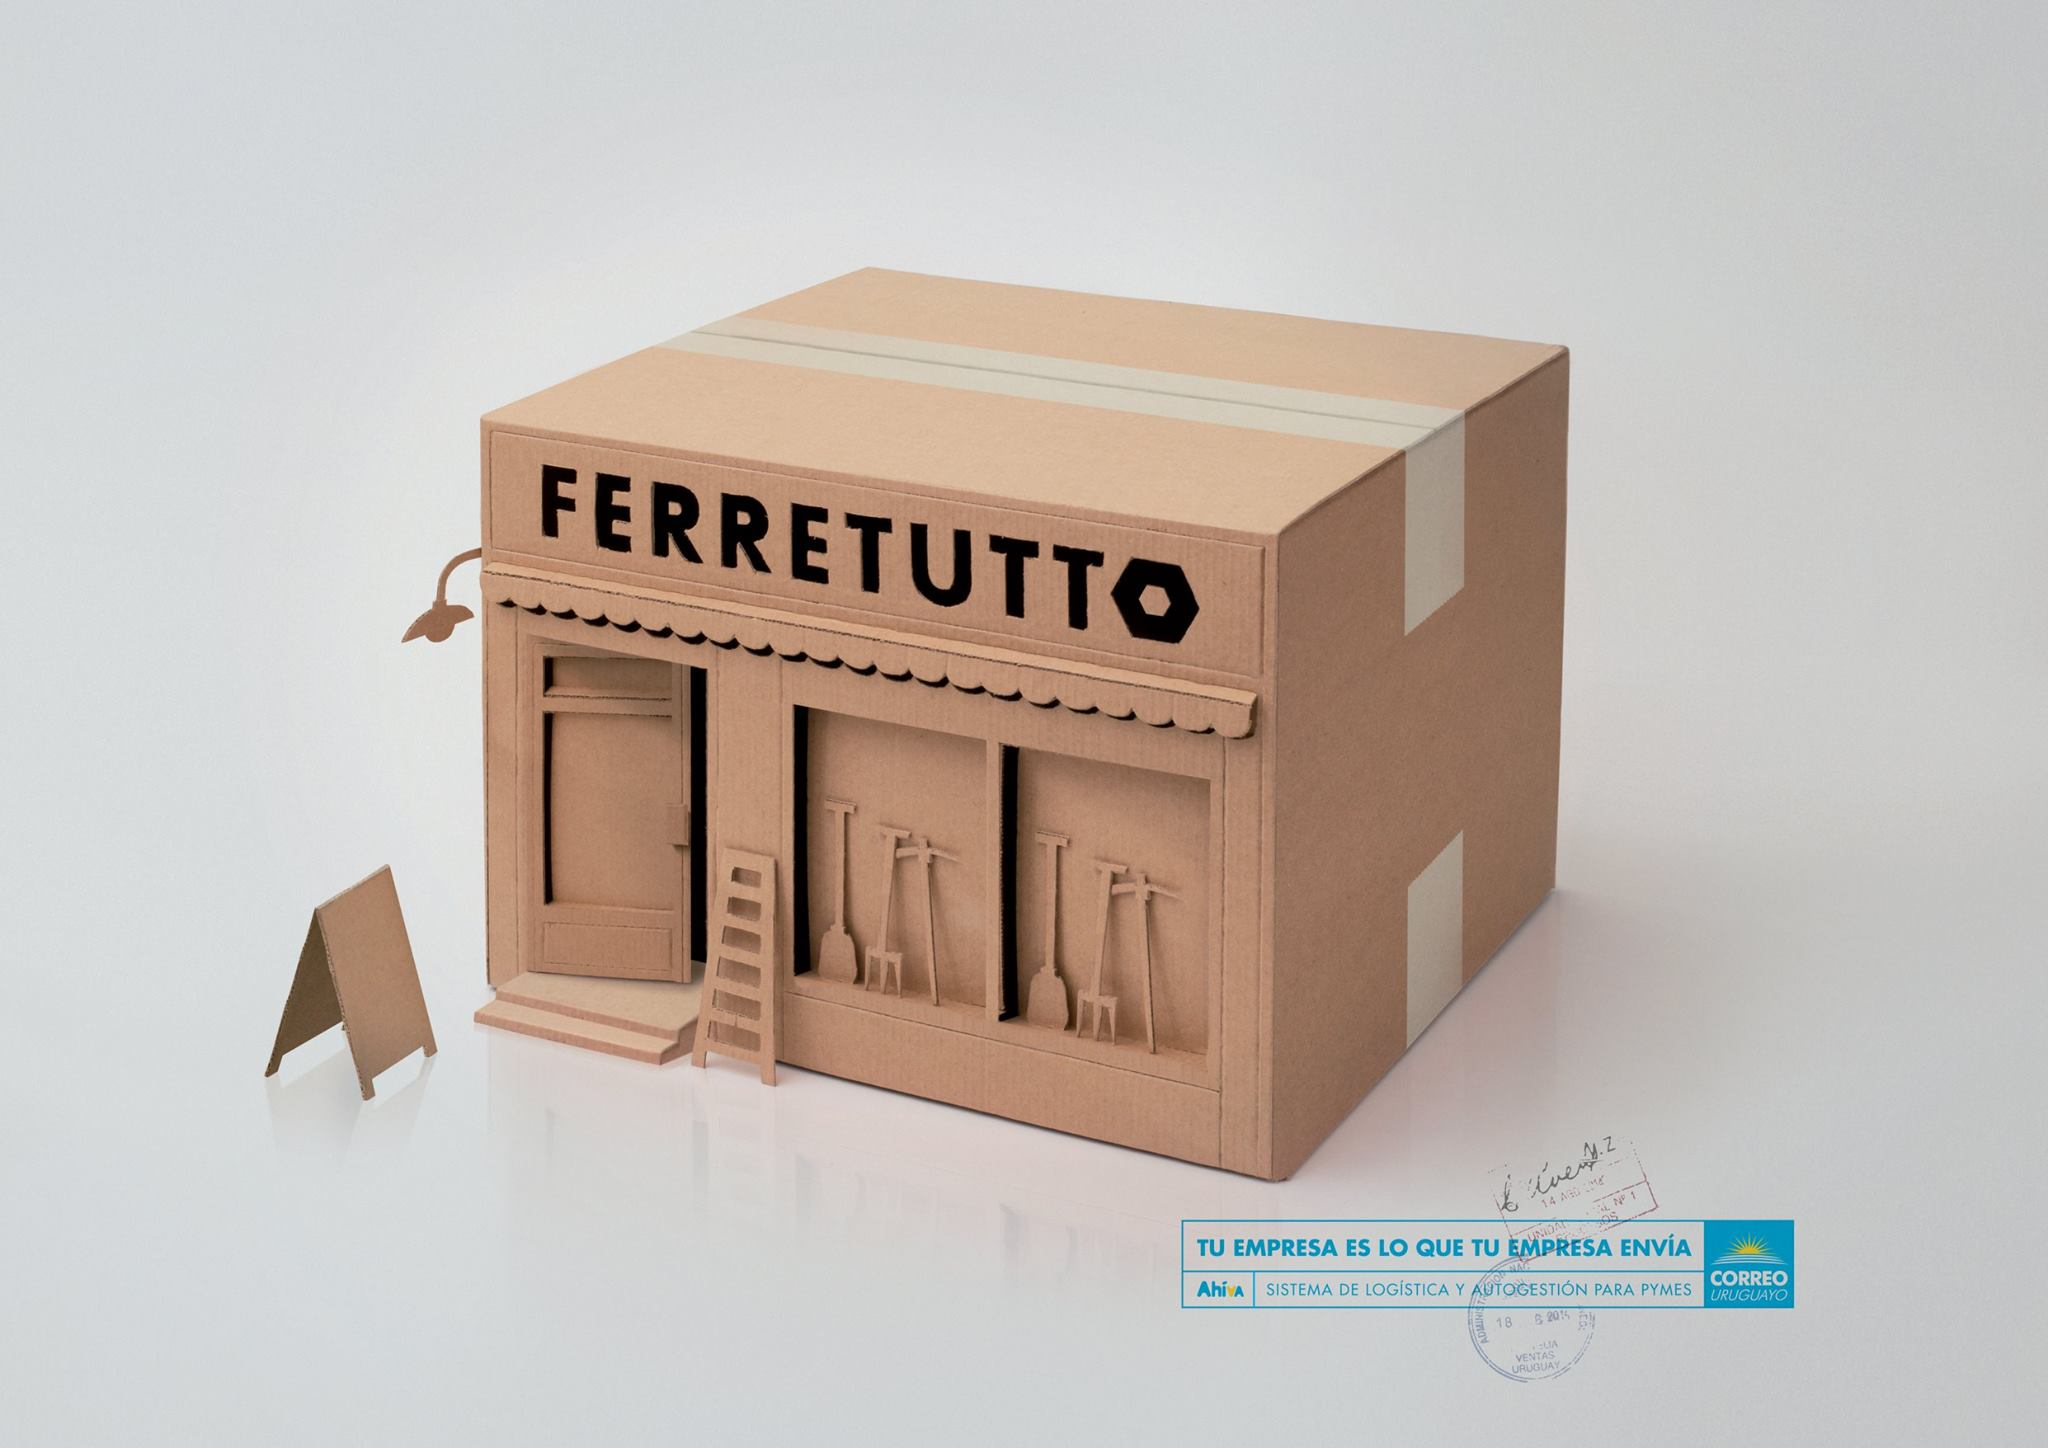 correo uruguayo